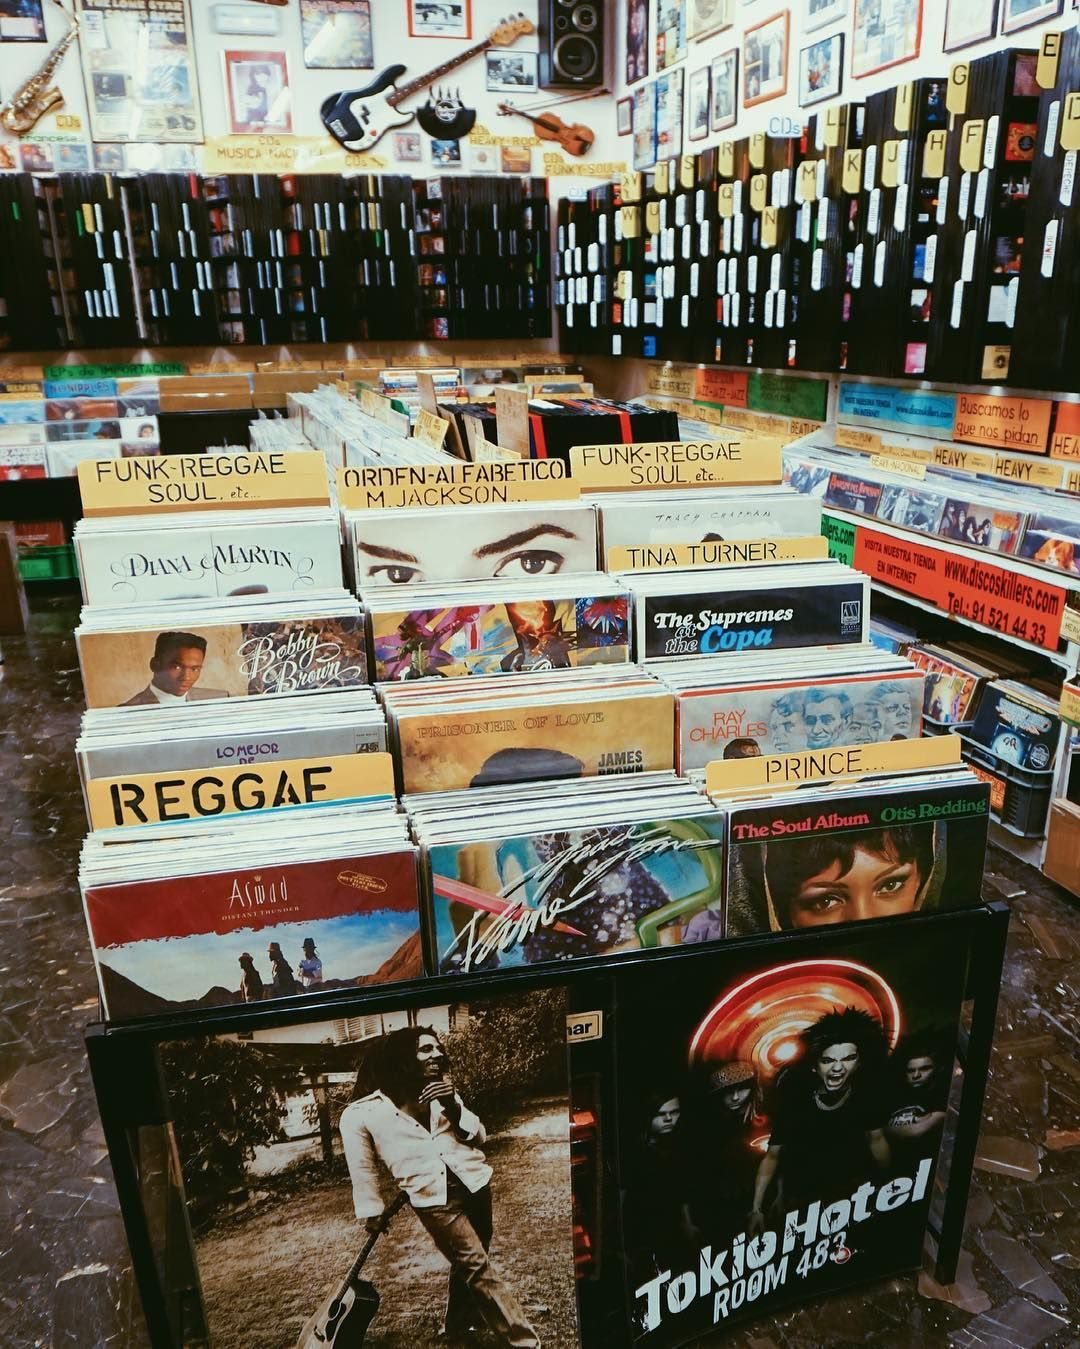 Grunge, Pictures, 90sgrunge, Aesthetics, Neon, Bath, Neon